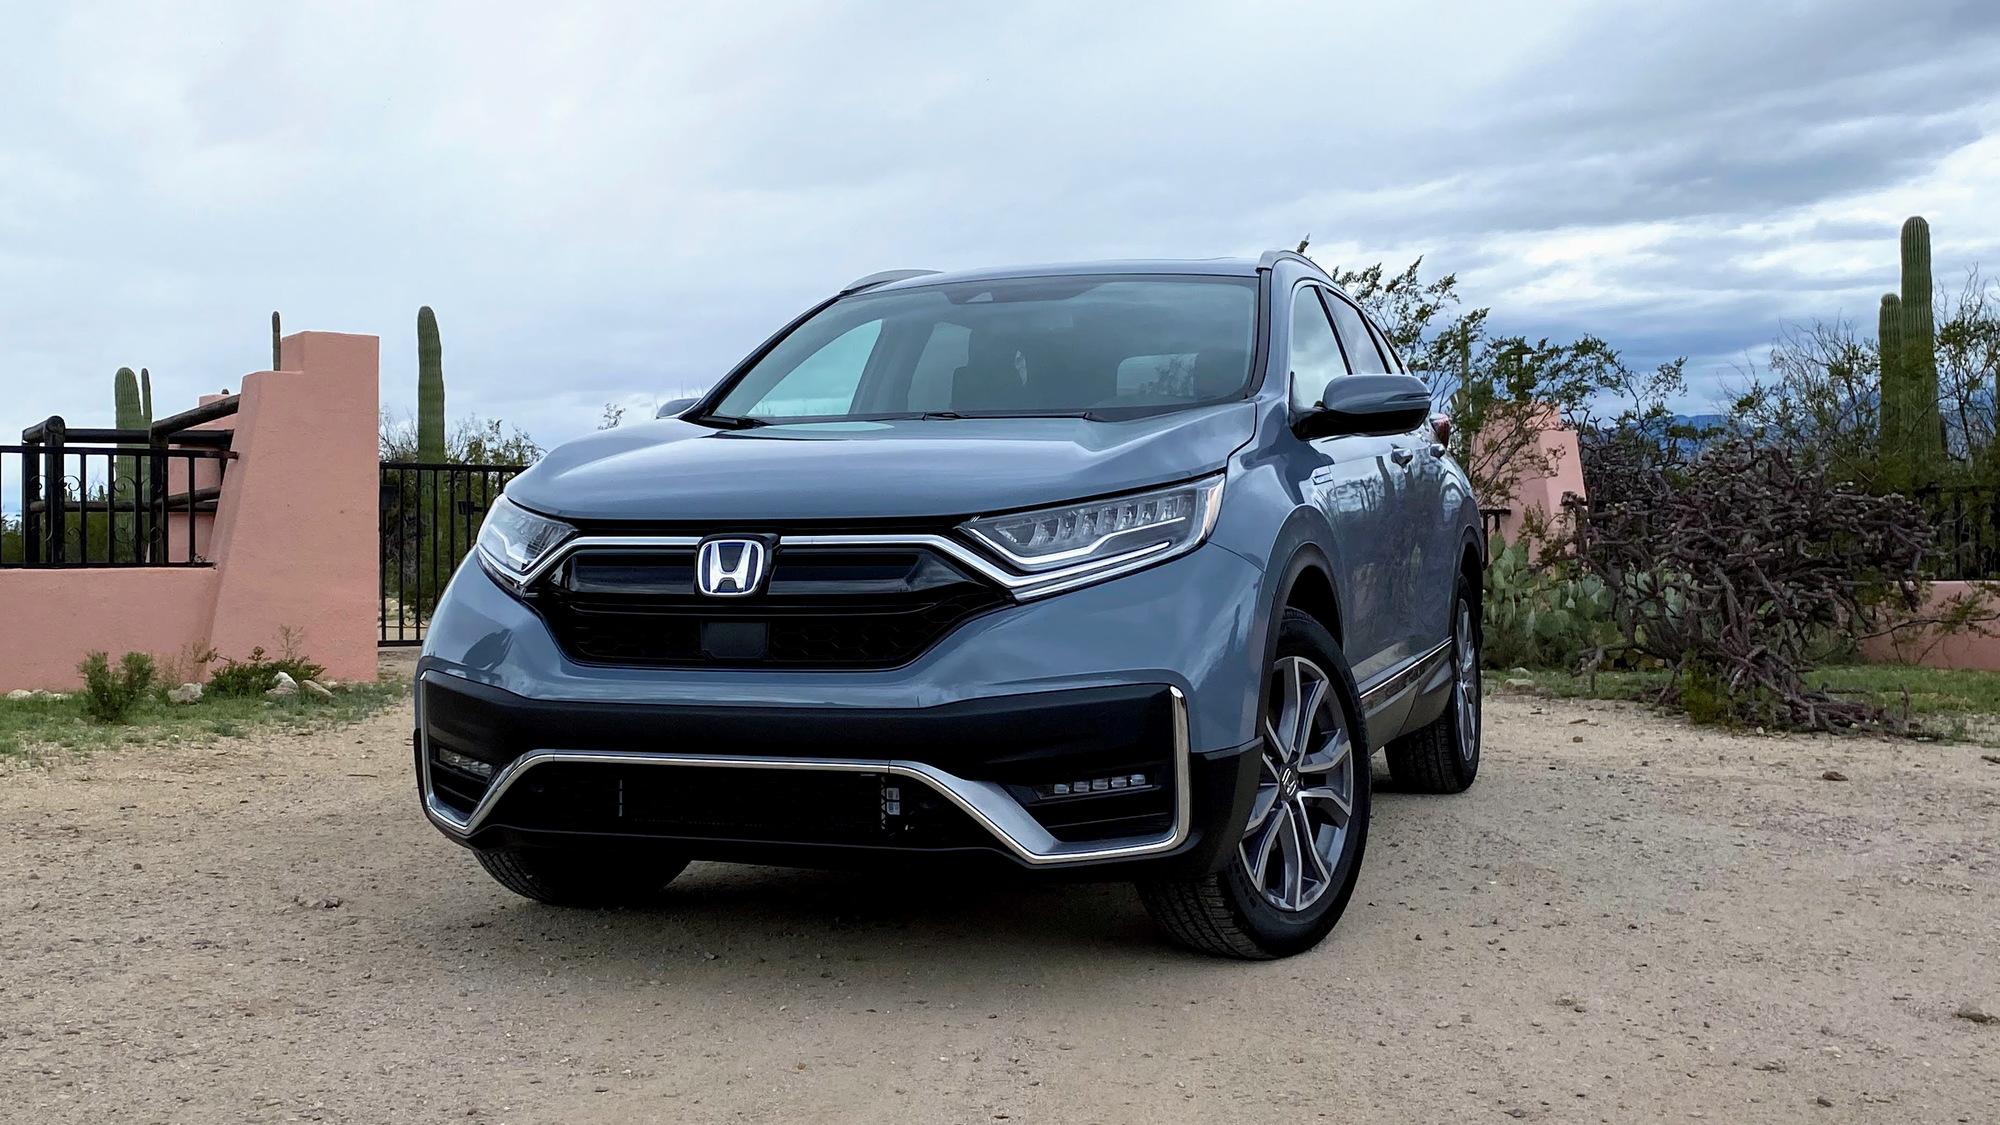 2020 Honda CR-V Hybrid  -  First Drive, March 2020